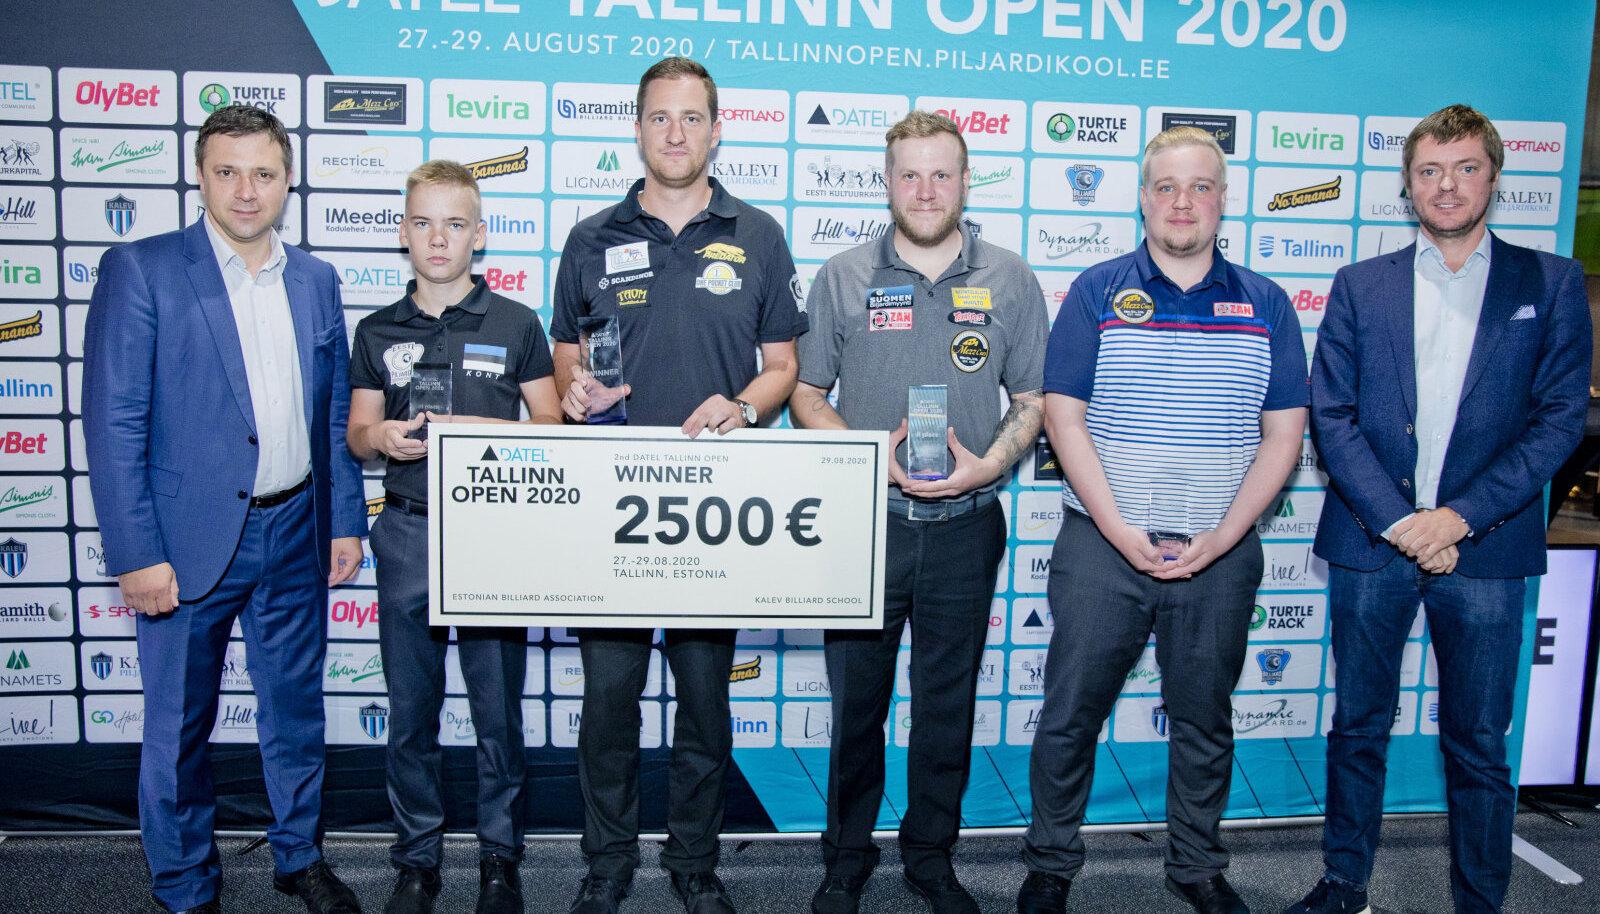 Fotol vasakult: Belobrovtsev, Kont, Grabe, Siekkinen, Makkonen, Kuusik